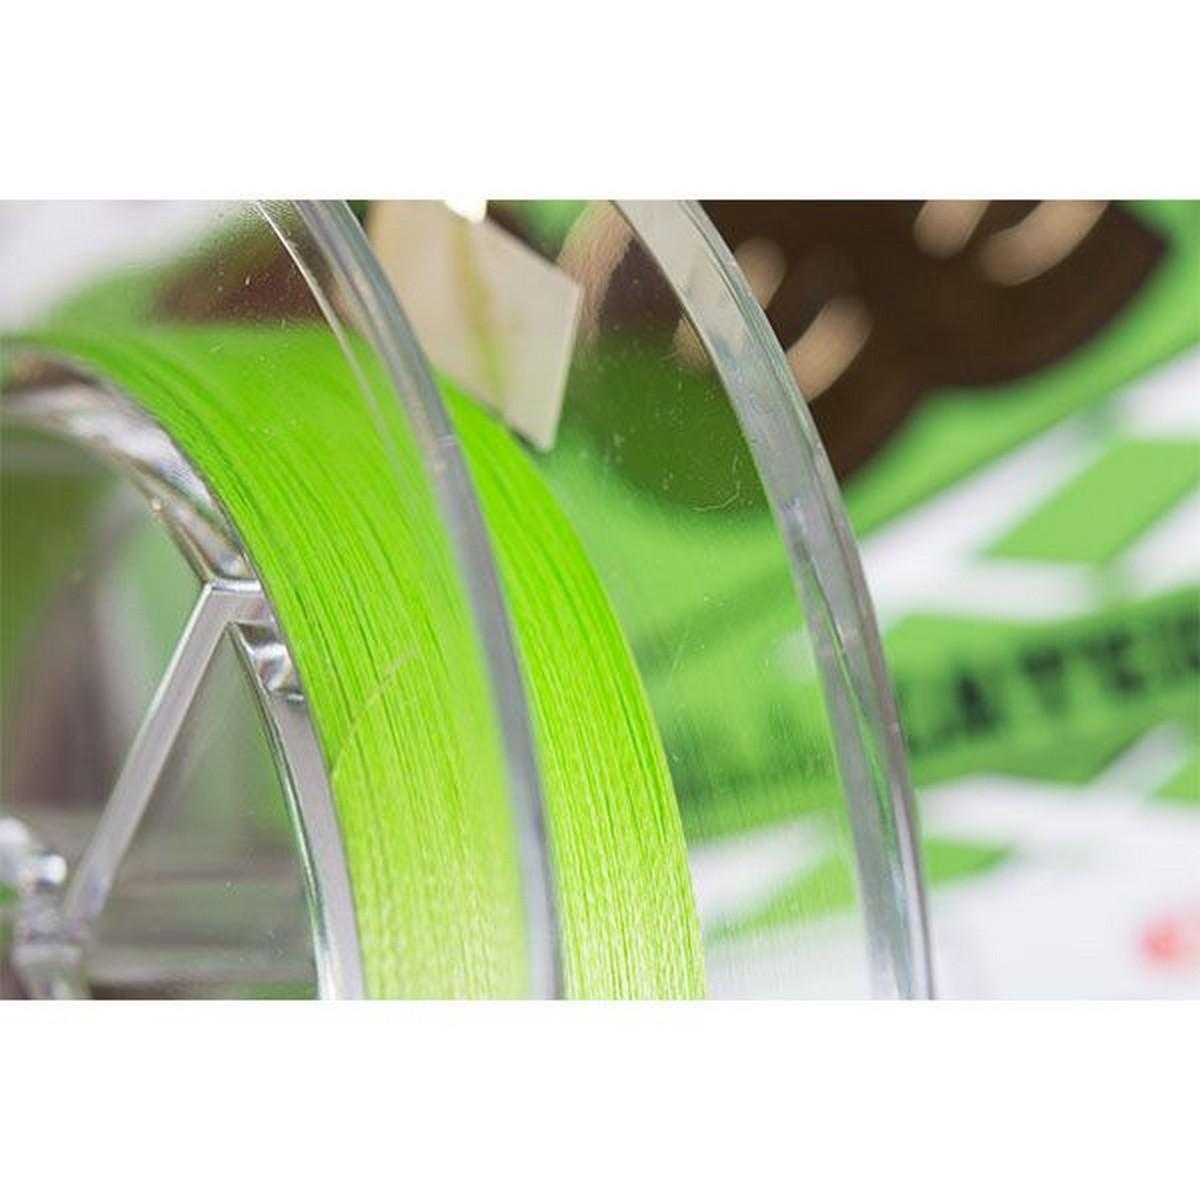 Плетено влакно Tailwalk Power Eye Pee Wee WX4 Lime Green 150m